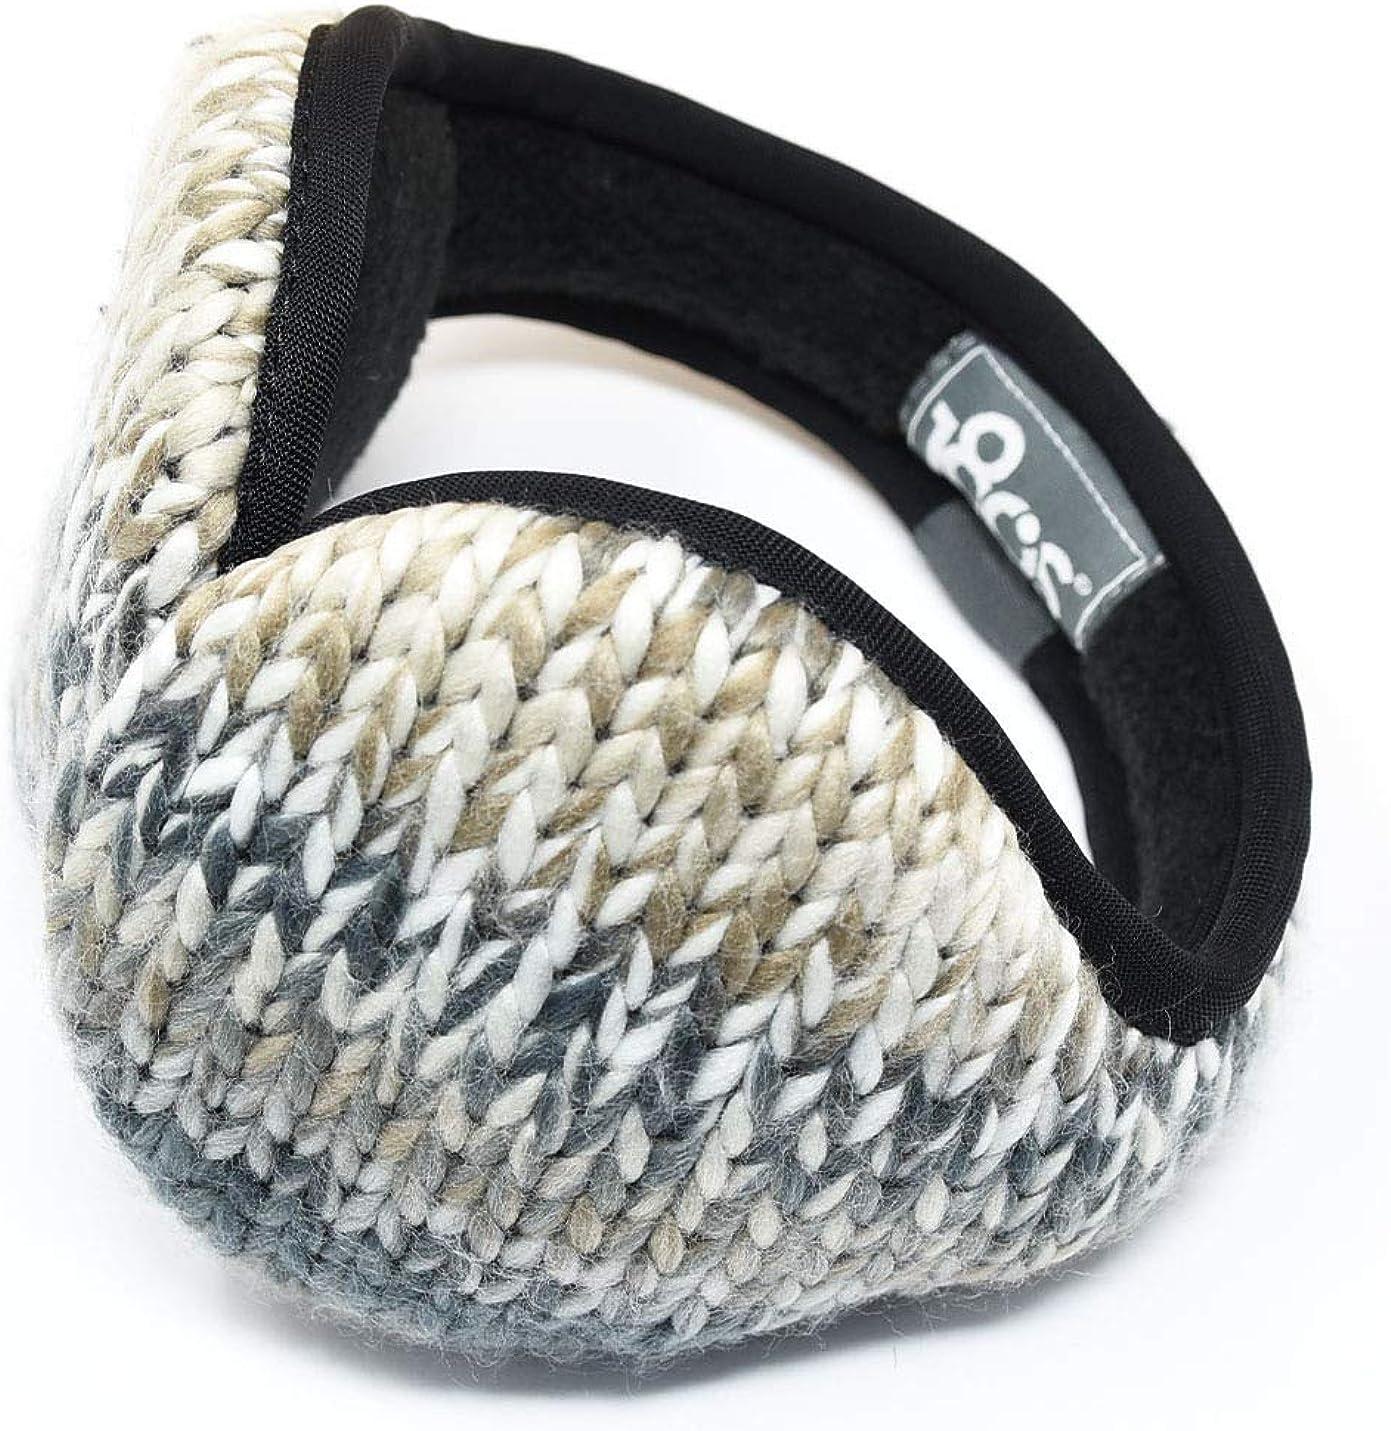 180s Kids' Tec Fleece Ear Warmer Adjustable Fully Collapsible Insulated Earmuffs, Black Multi, Size